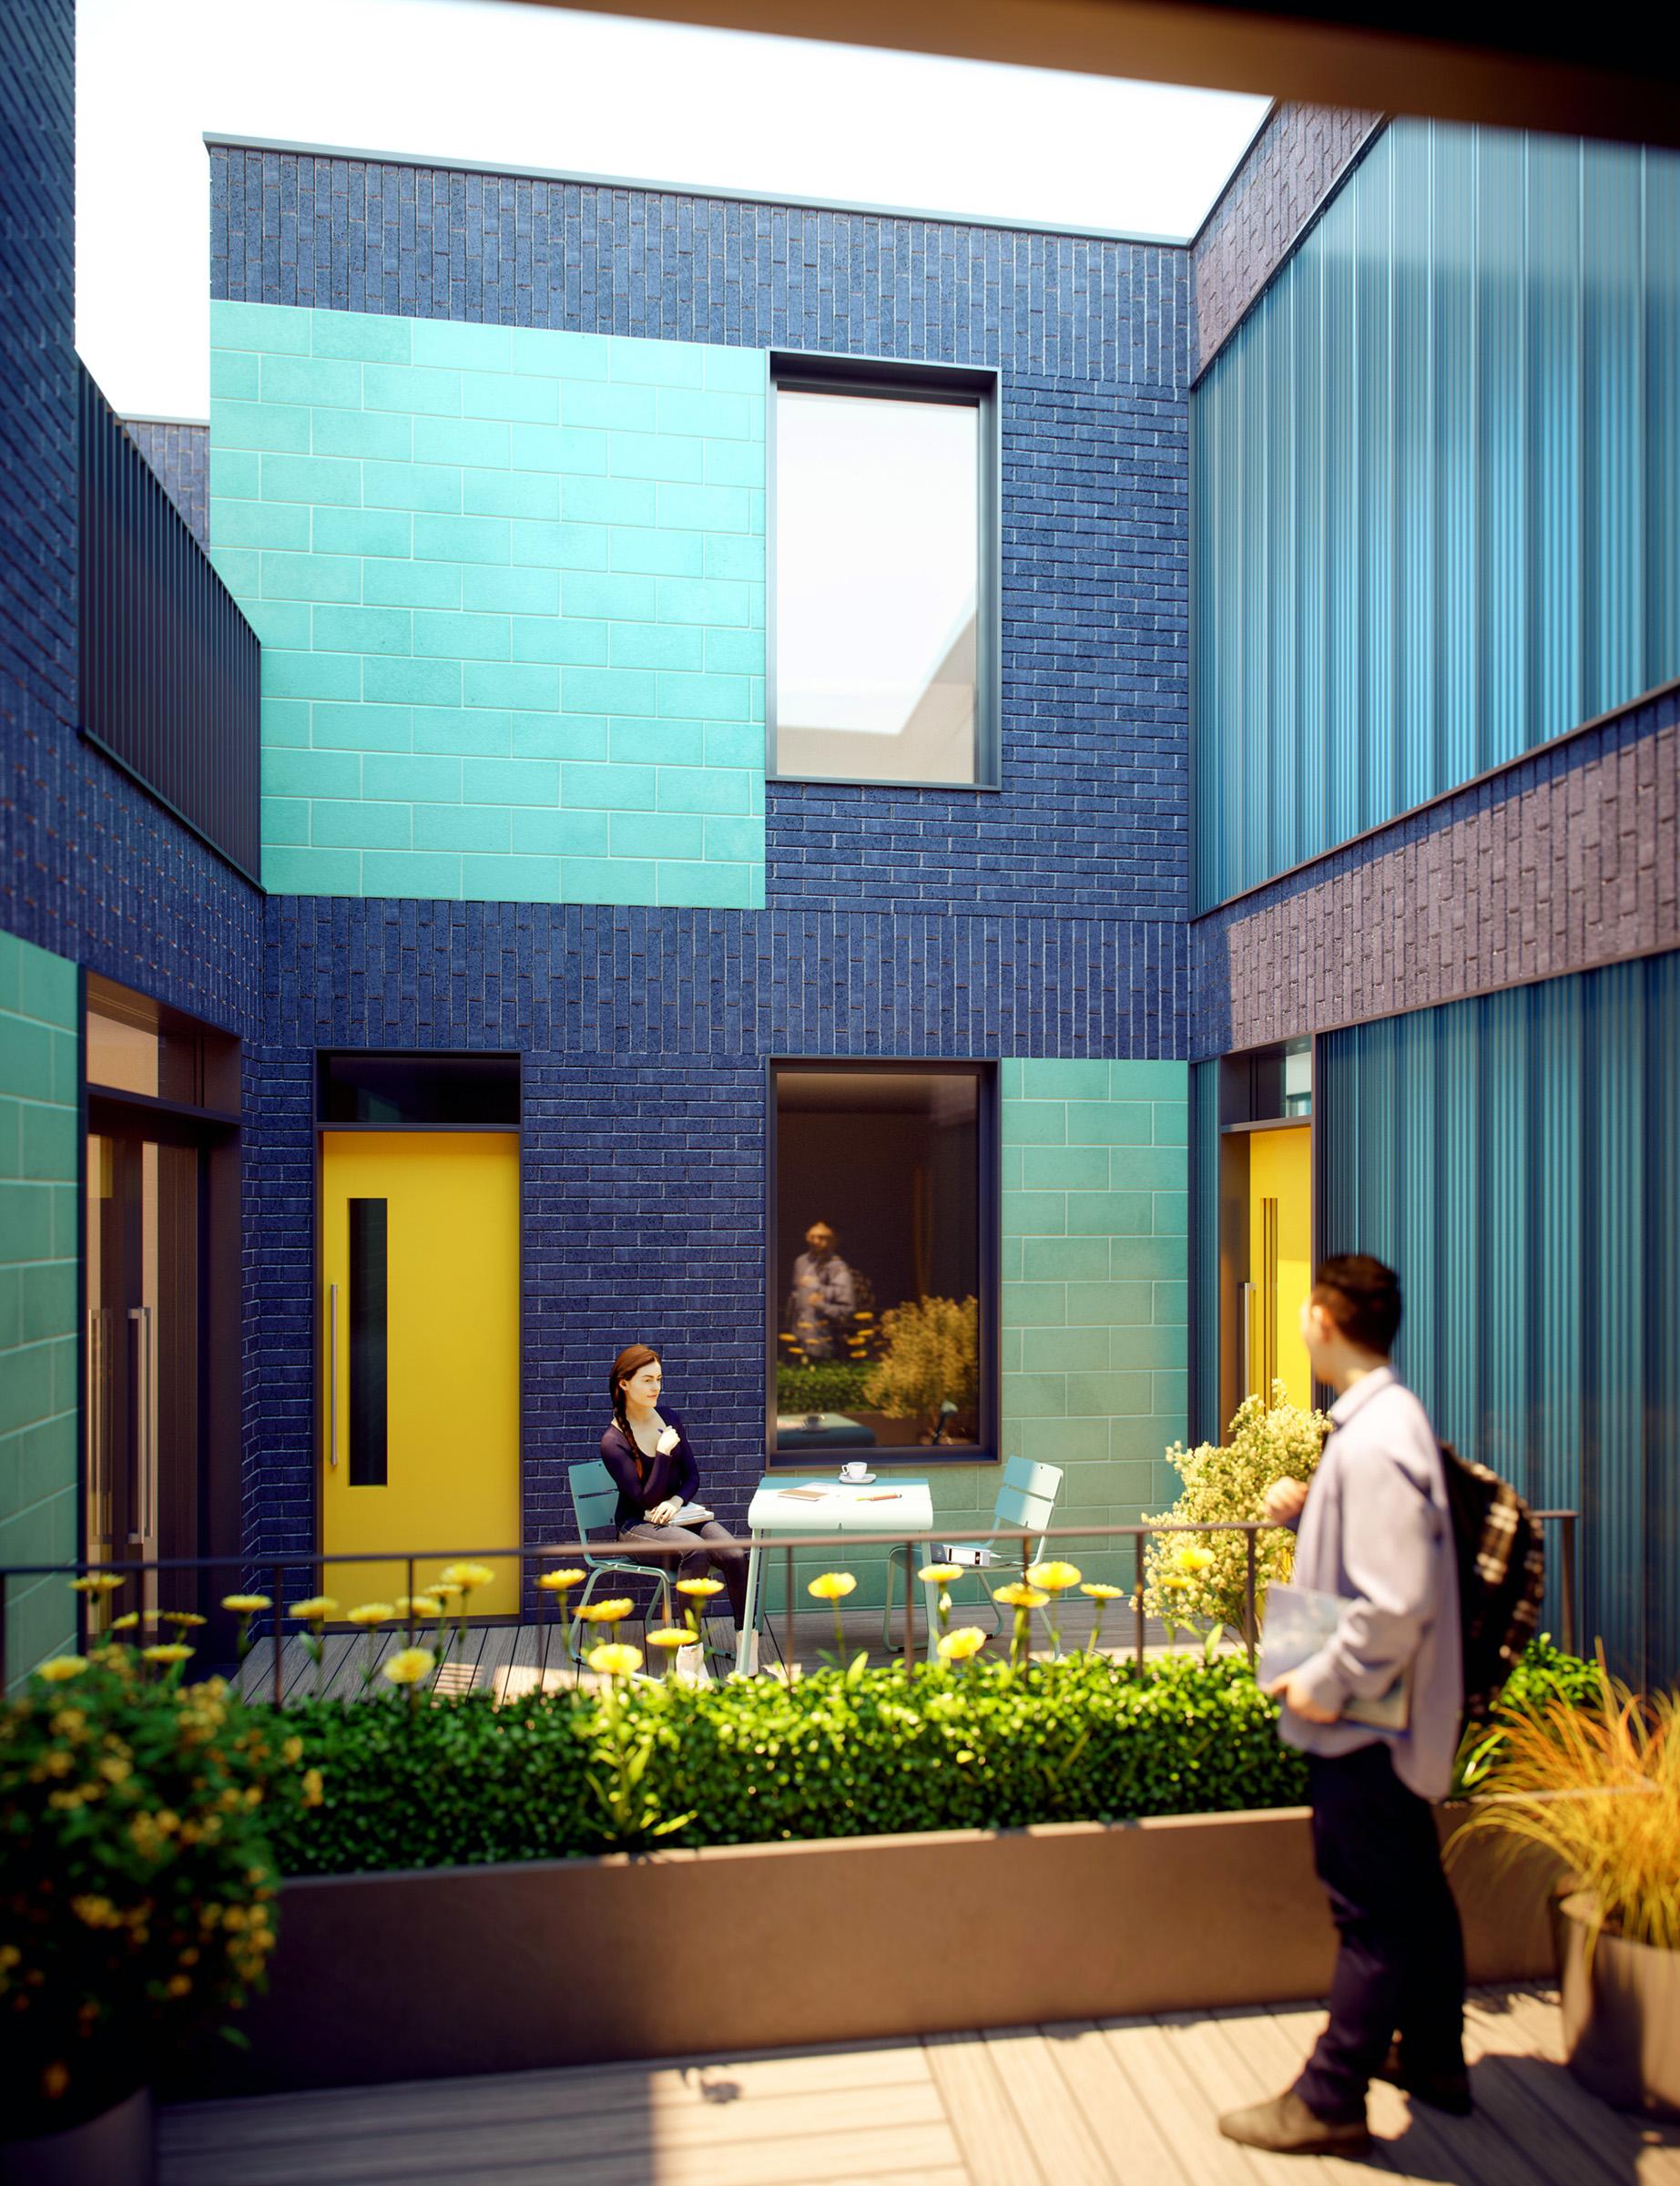 Counter-Projects-UK-Falmouth-Cornwall-CGI-Architectural-Visualisation-3d-Illustration-Motaman1.jpg